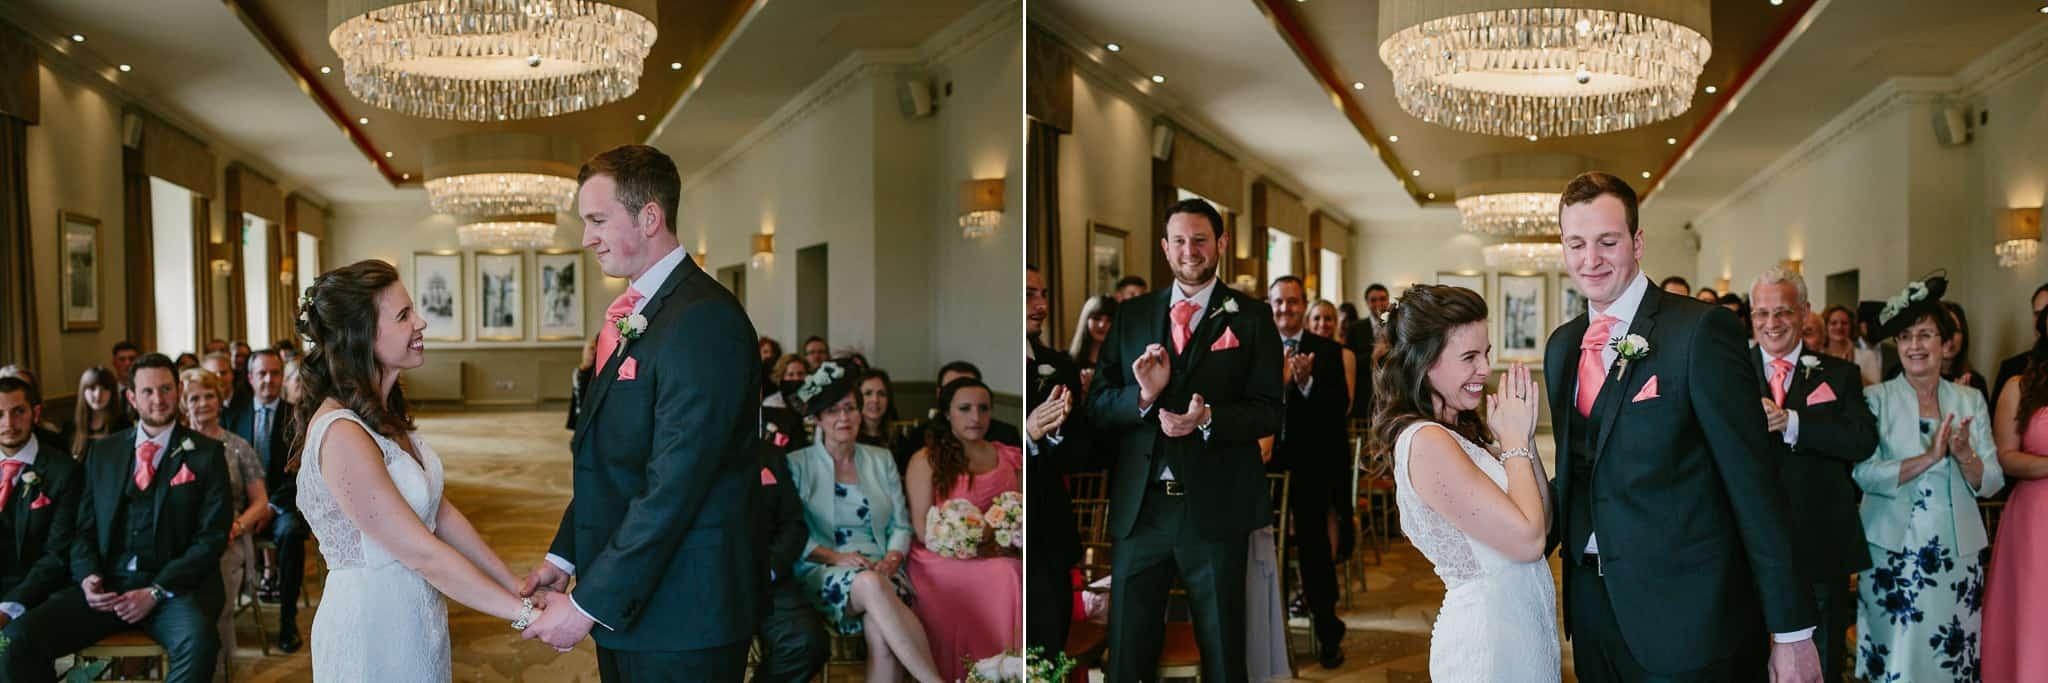 Sebastien Bicard • Wedding Photographer • Leeds, England •Spalding-33